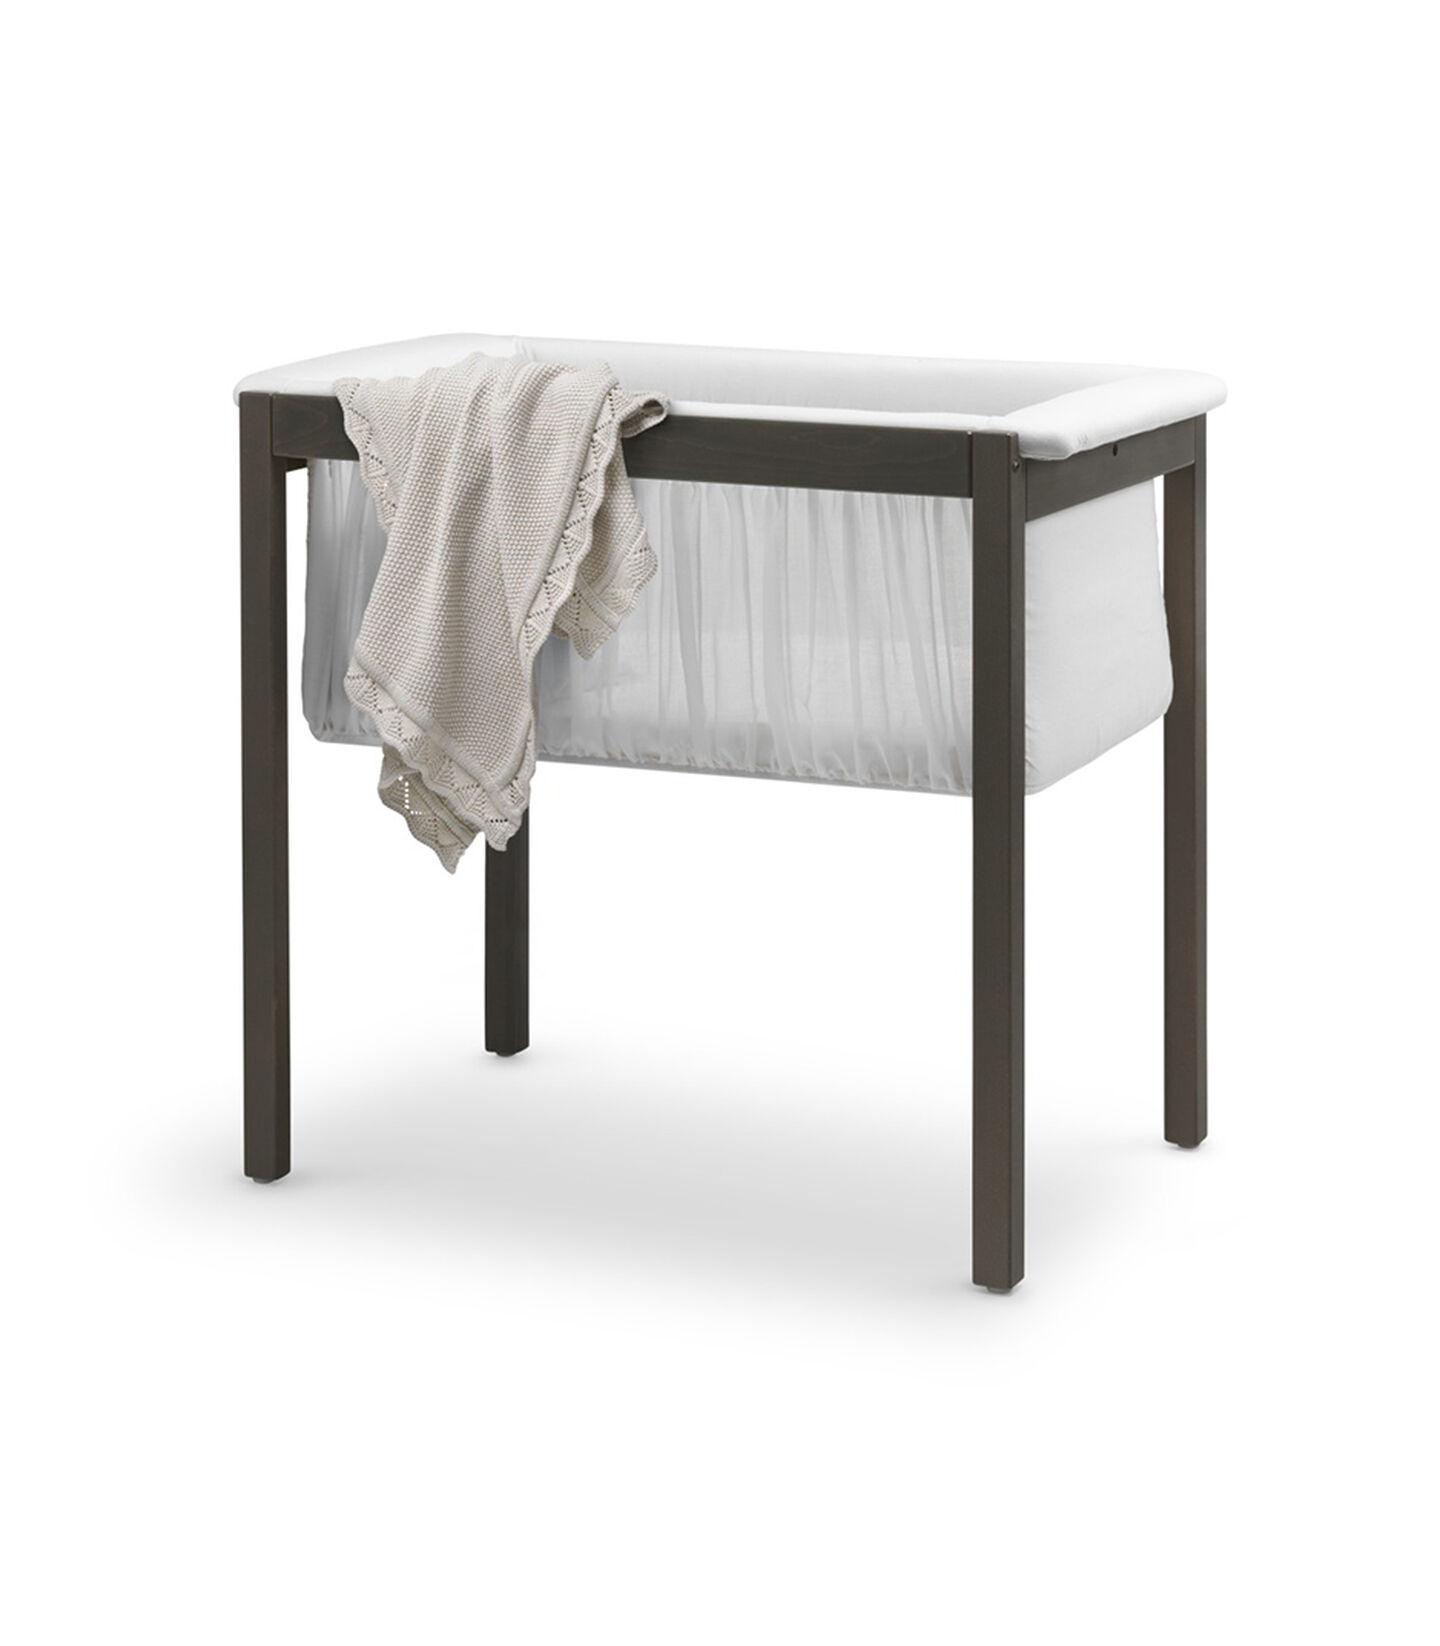 Stokke® Home™ Cradle, Hazy Grey.